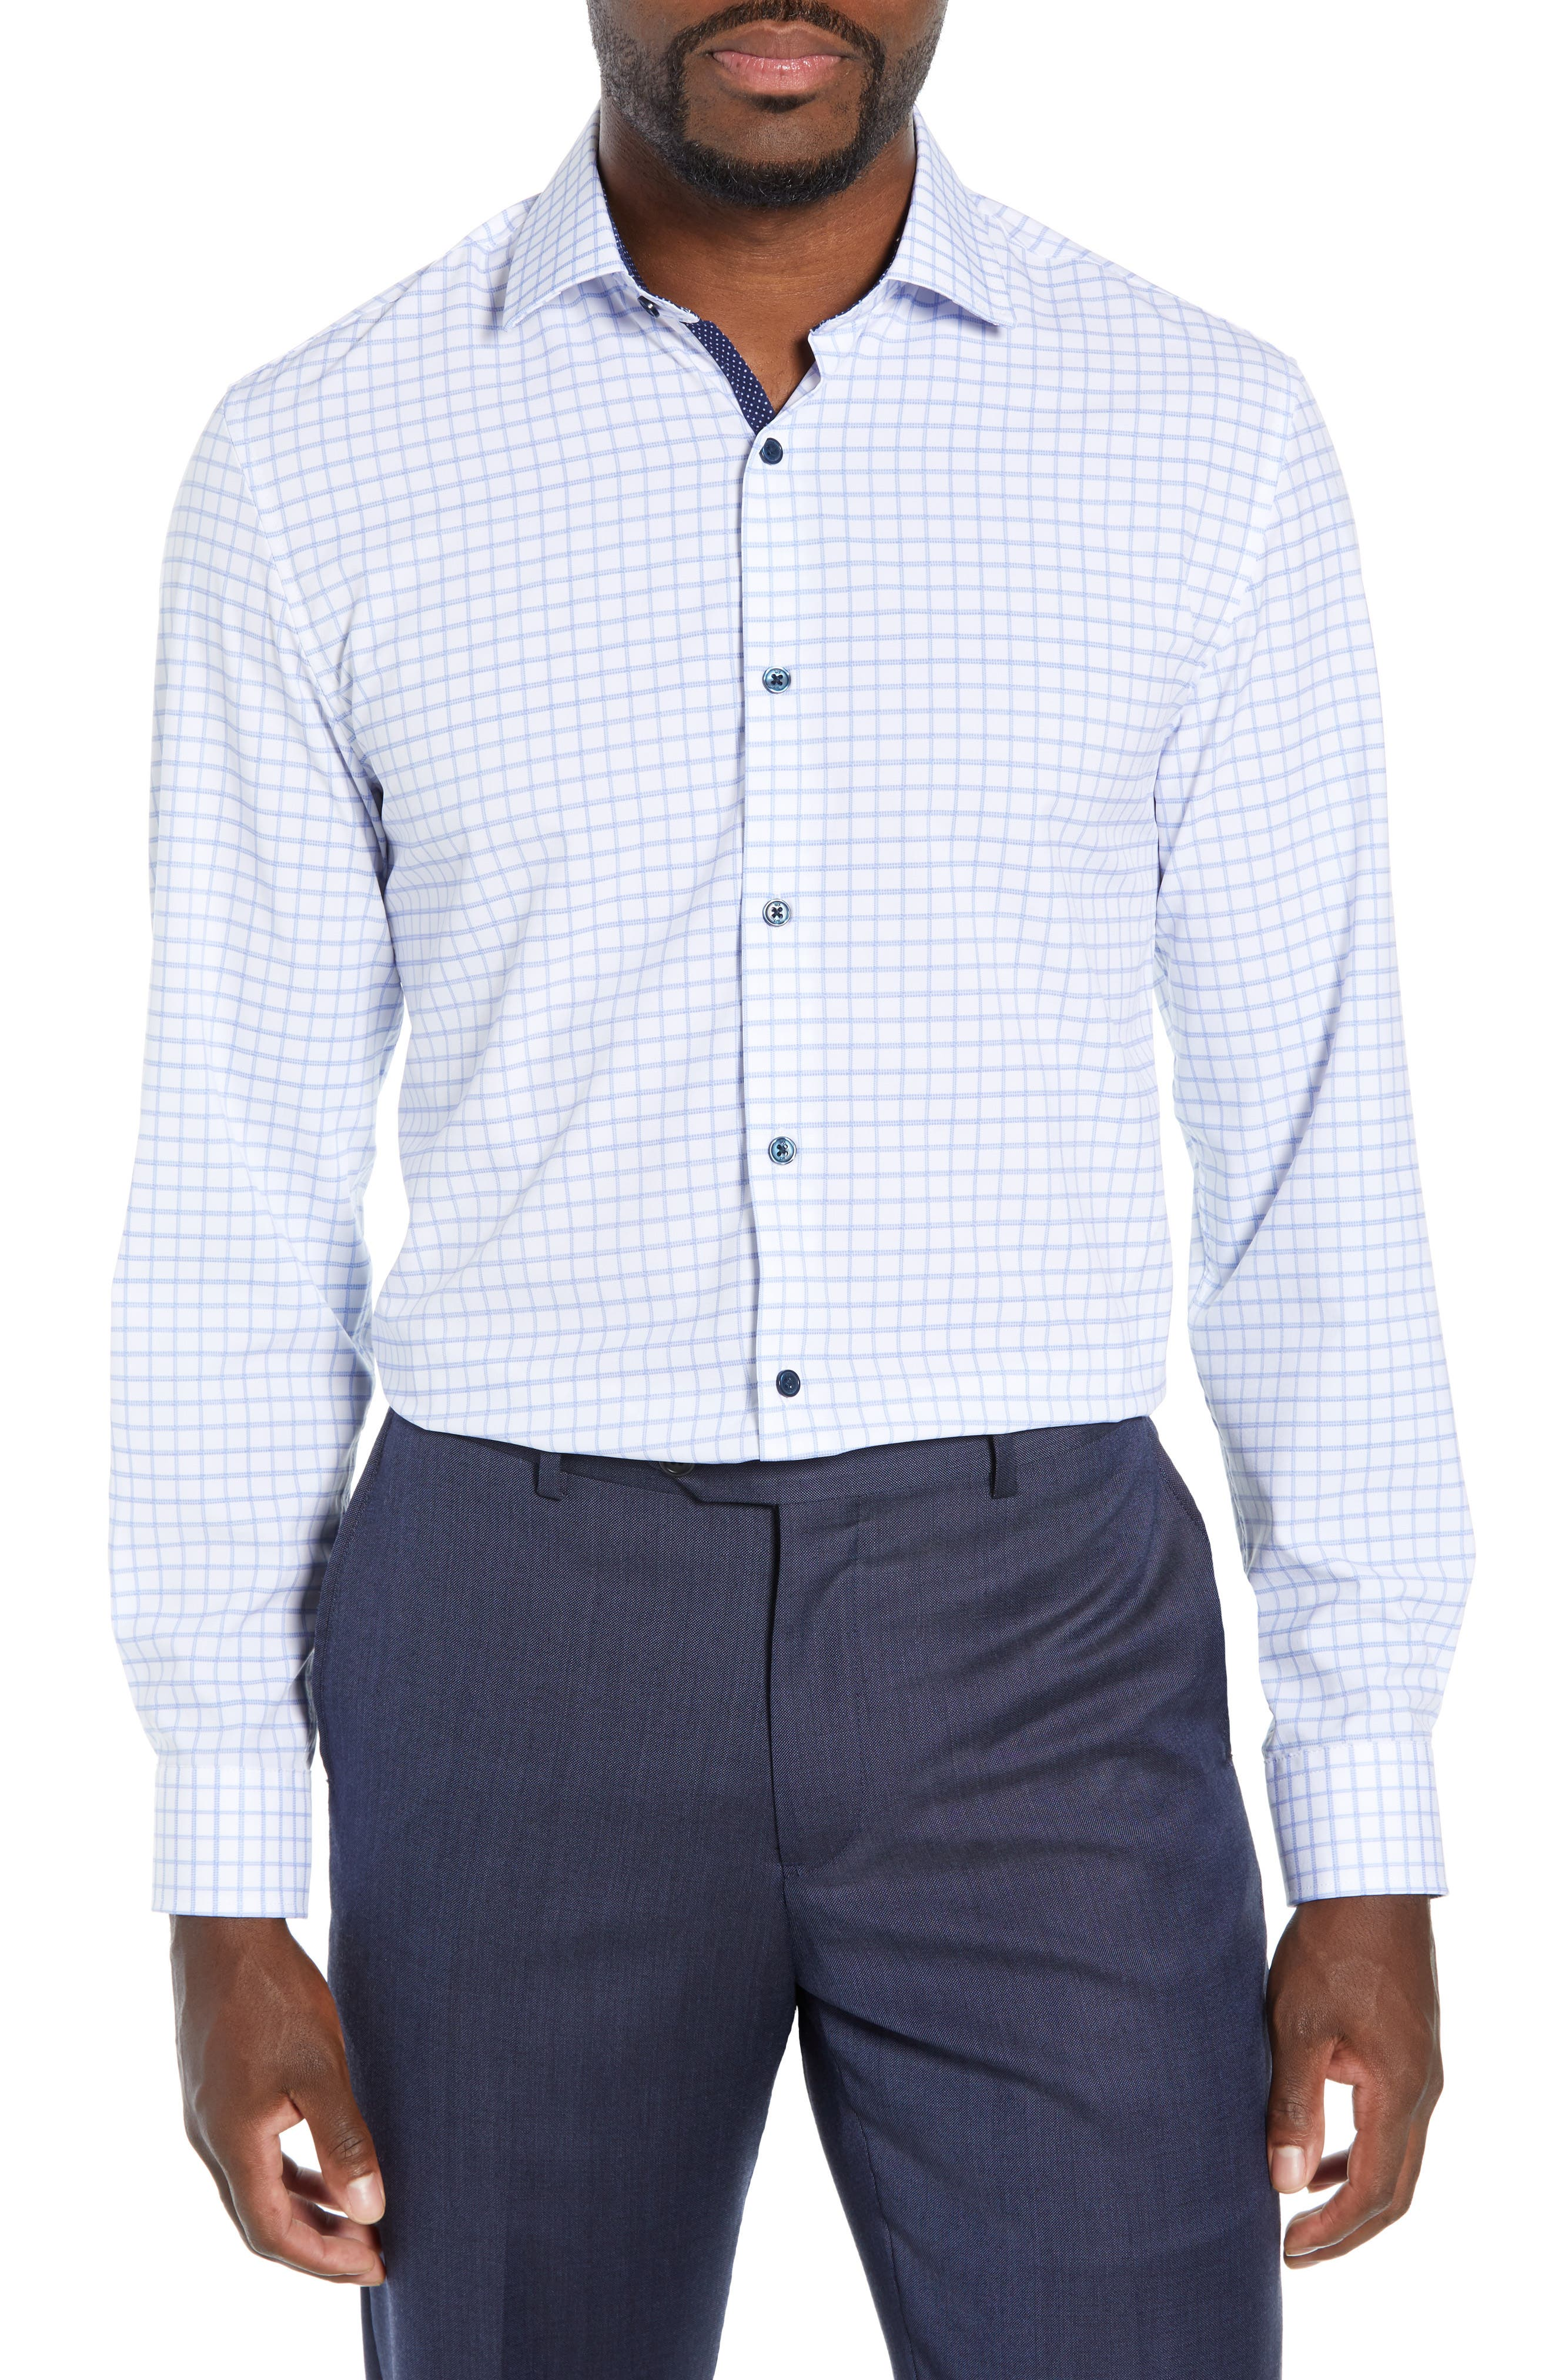 Trim Fit 4-Way Stretch Check Dress Shirt,                             Main thumbnail 1, color,                             WHITE